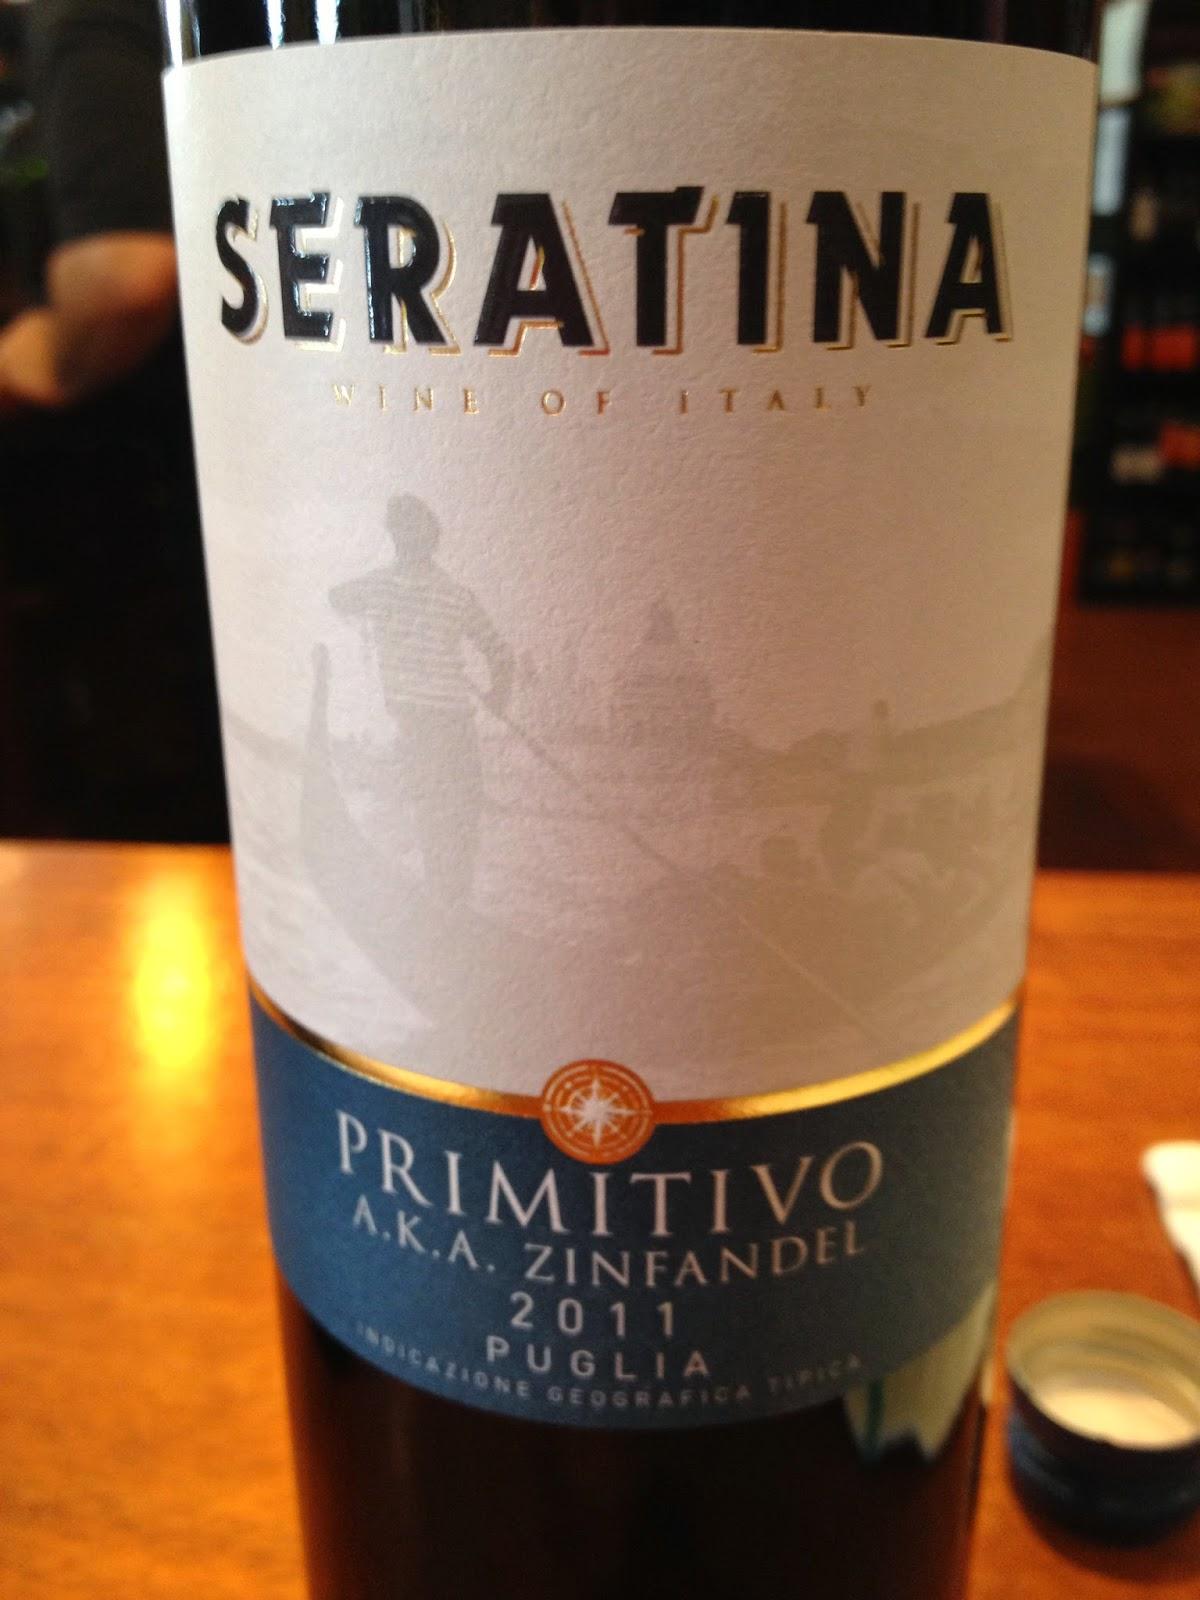 2011 Seratina Primitivo wine from Puglia